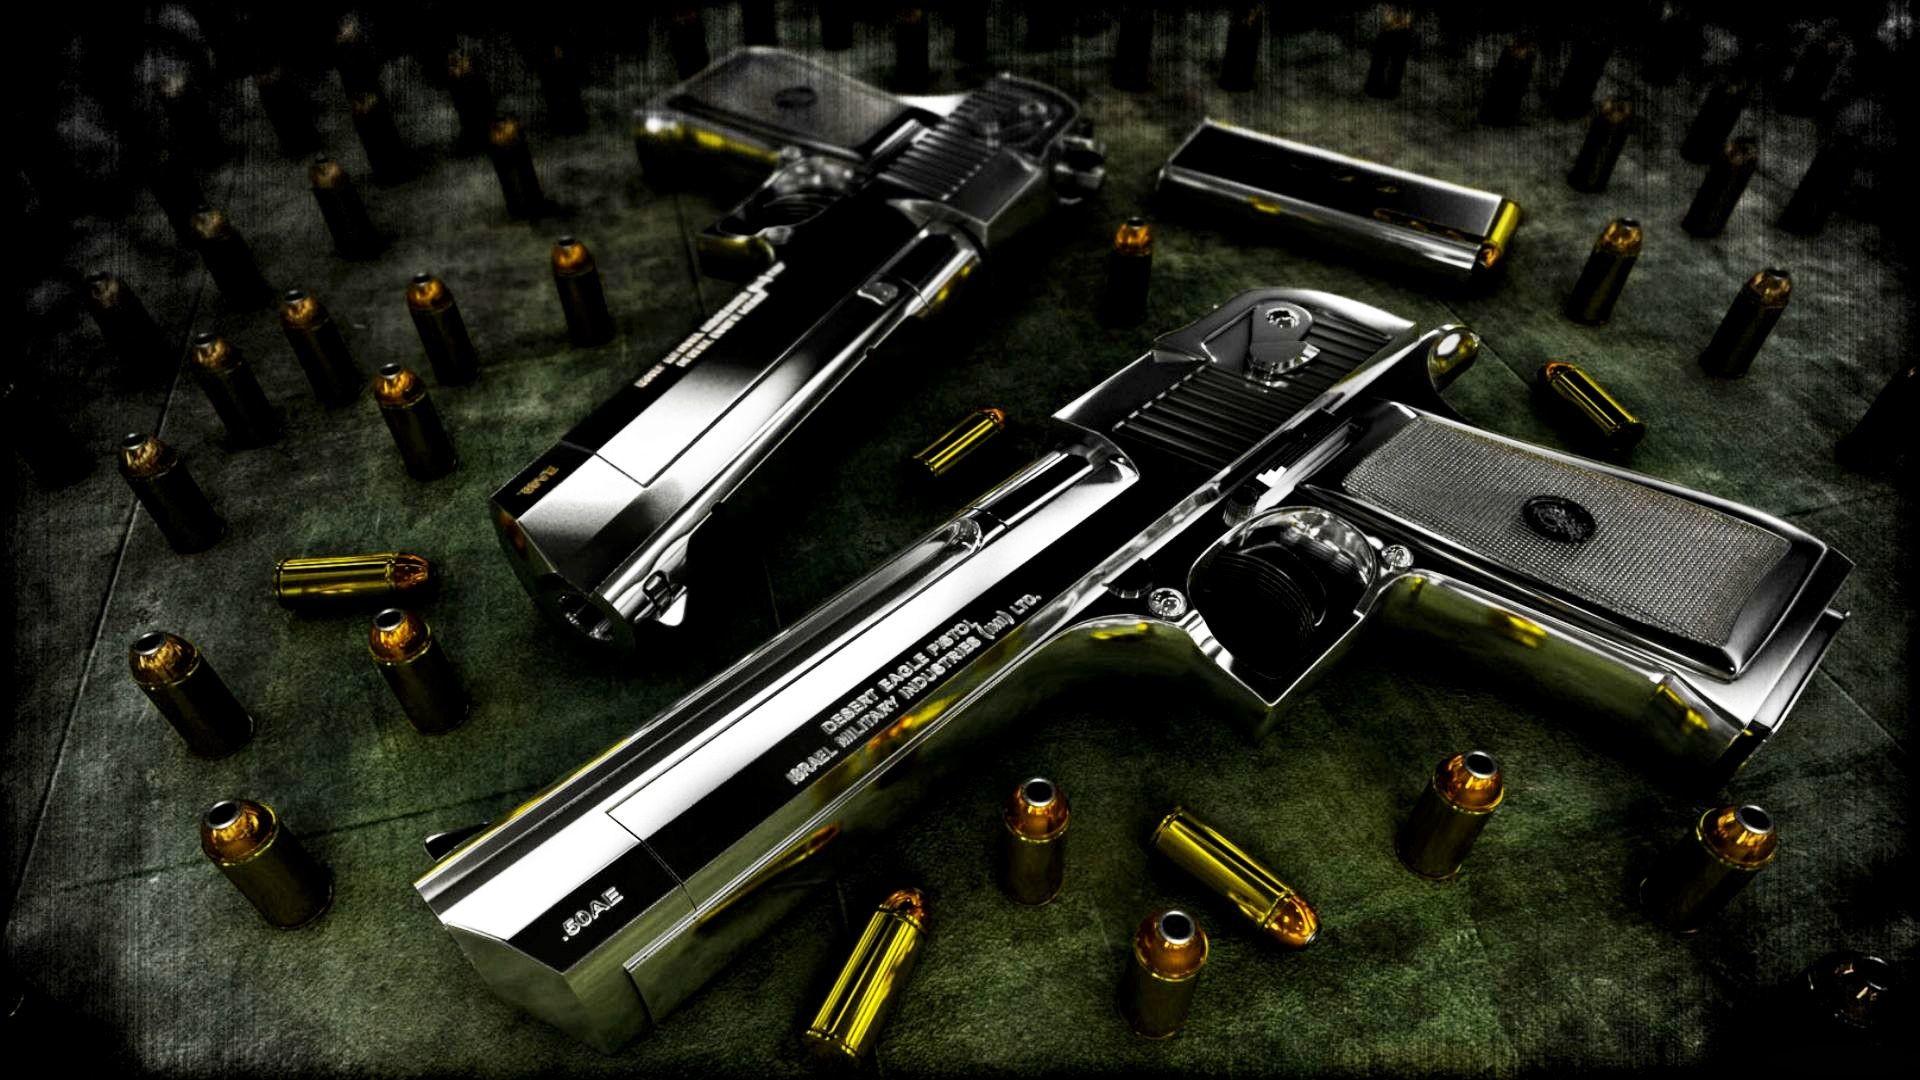 72 3D Guns Wallpapers on WallpaperPlay 1920x1080